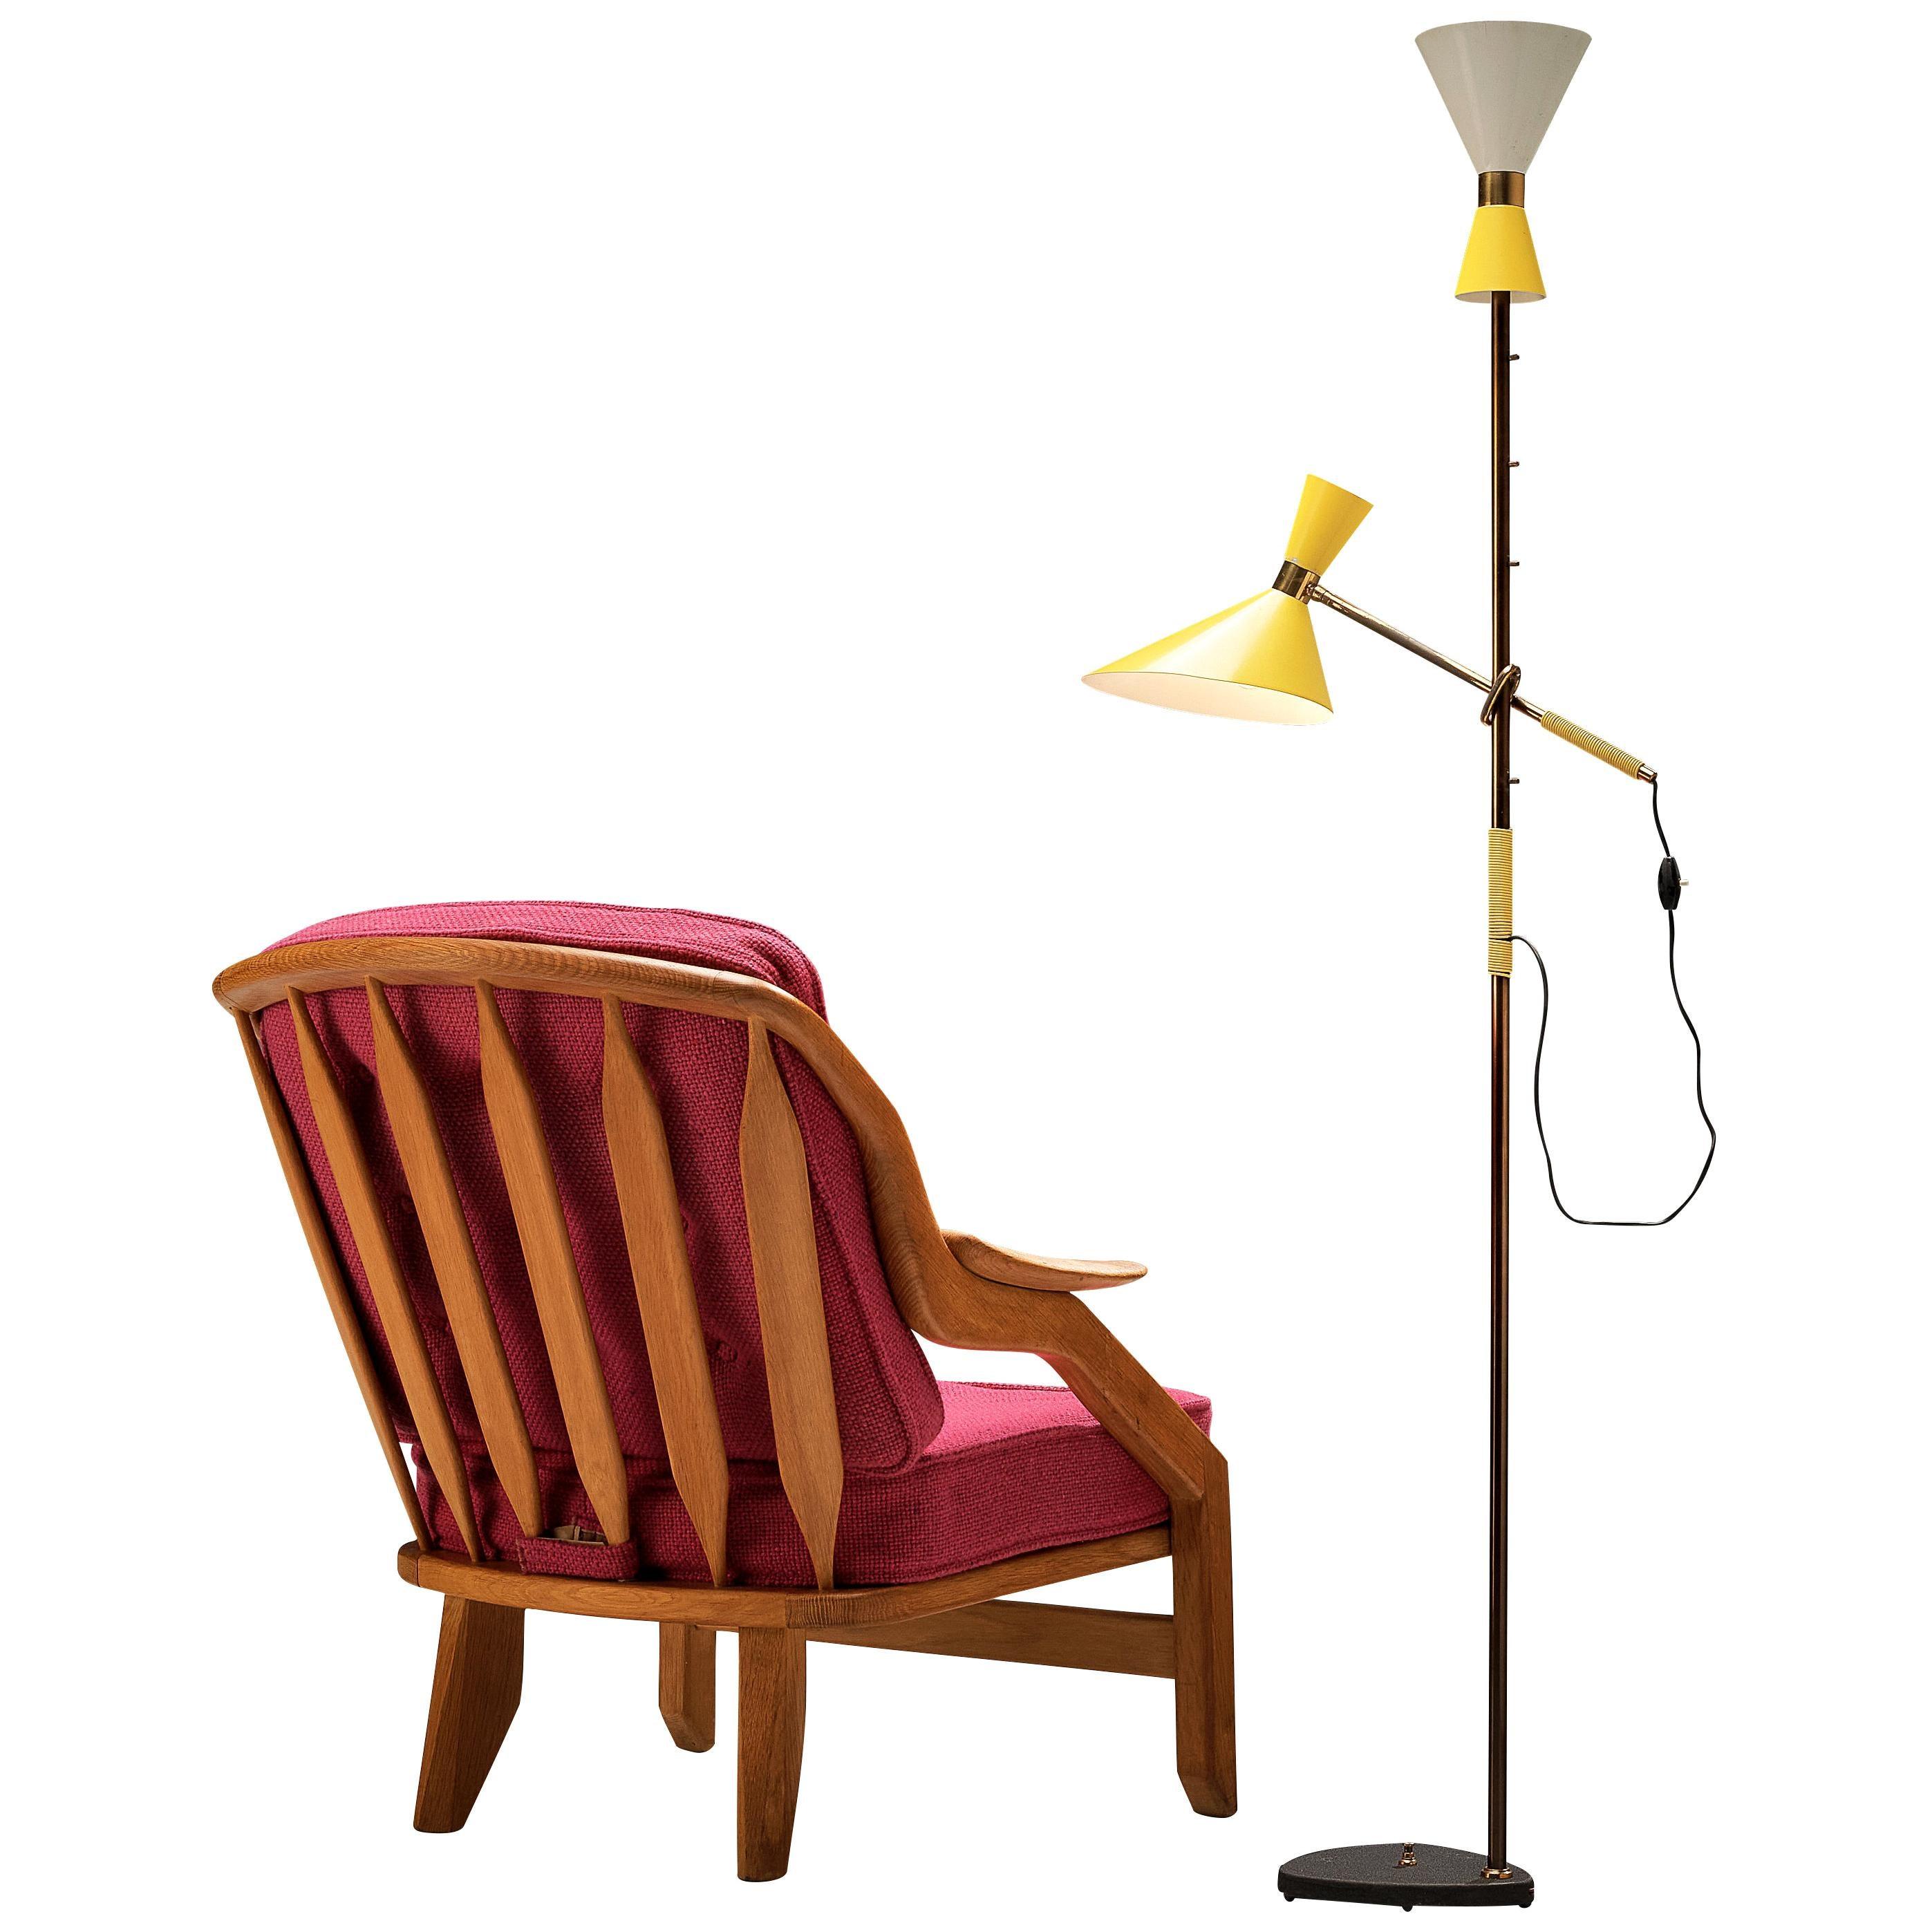 Guillerme & Chambron Lounge Chair and J.T. Kalmar 'Pelikan' Floor Lamp